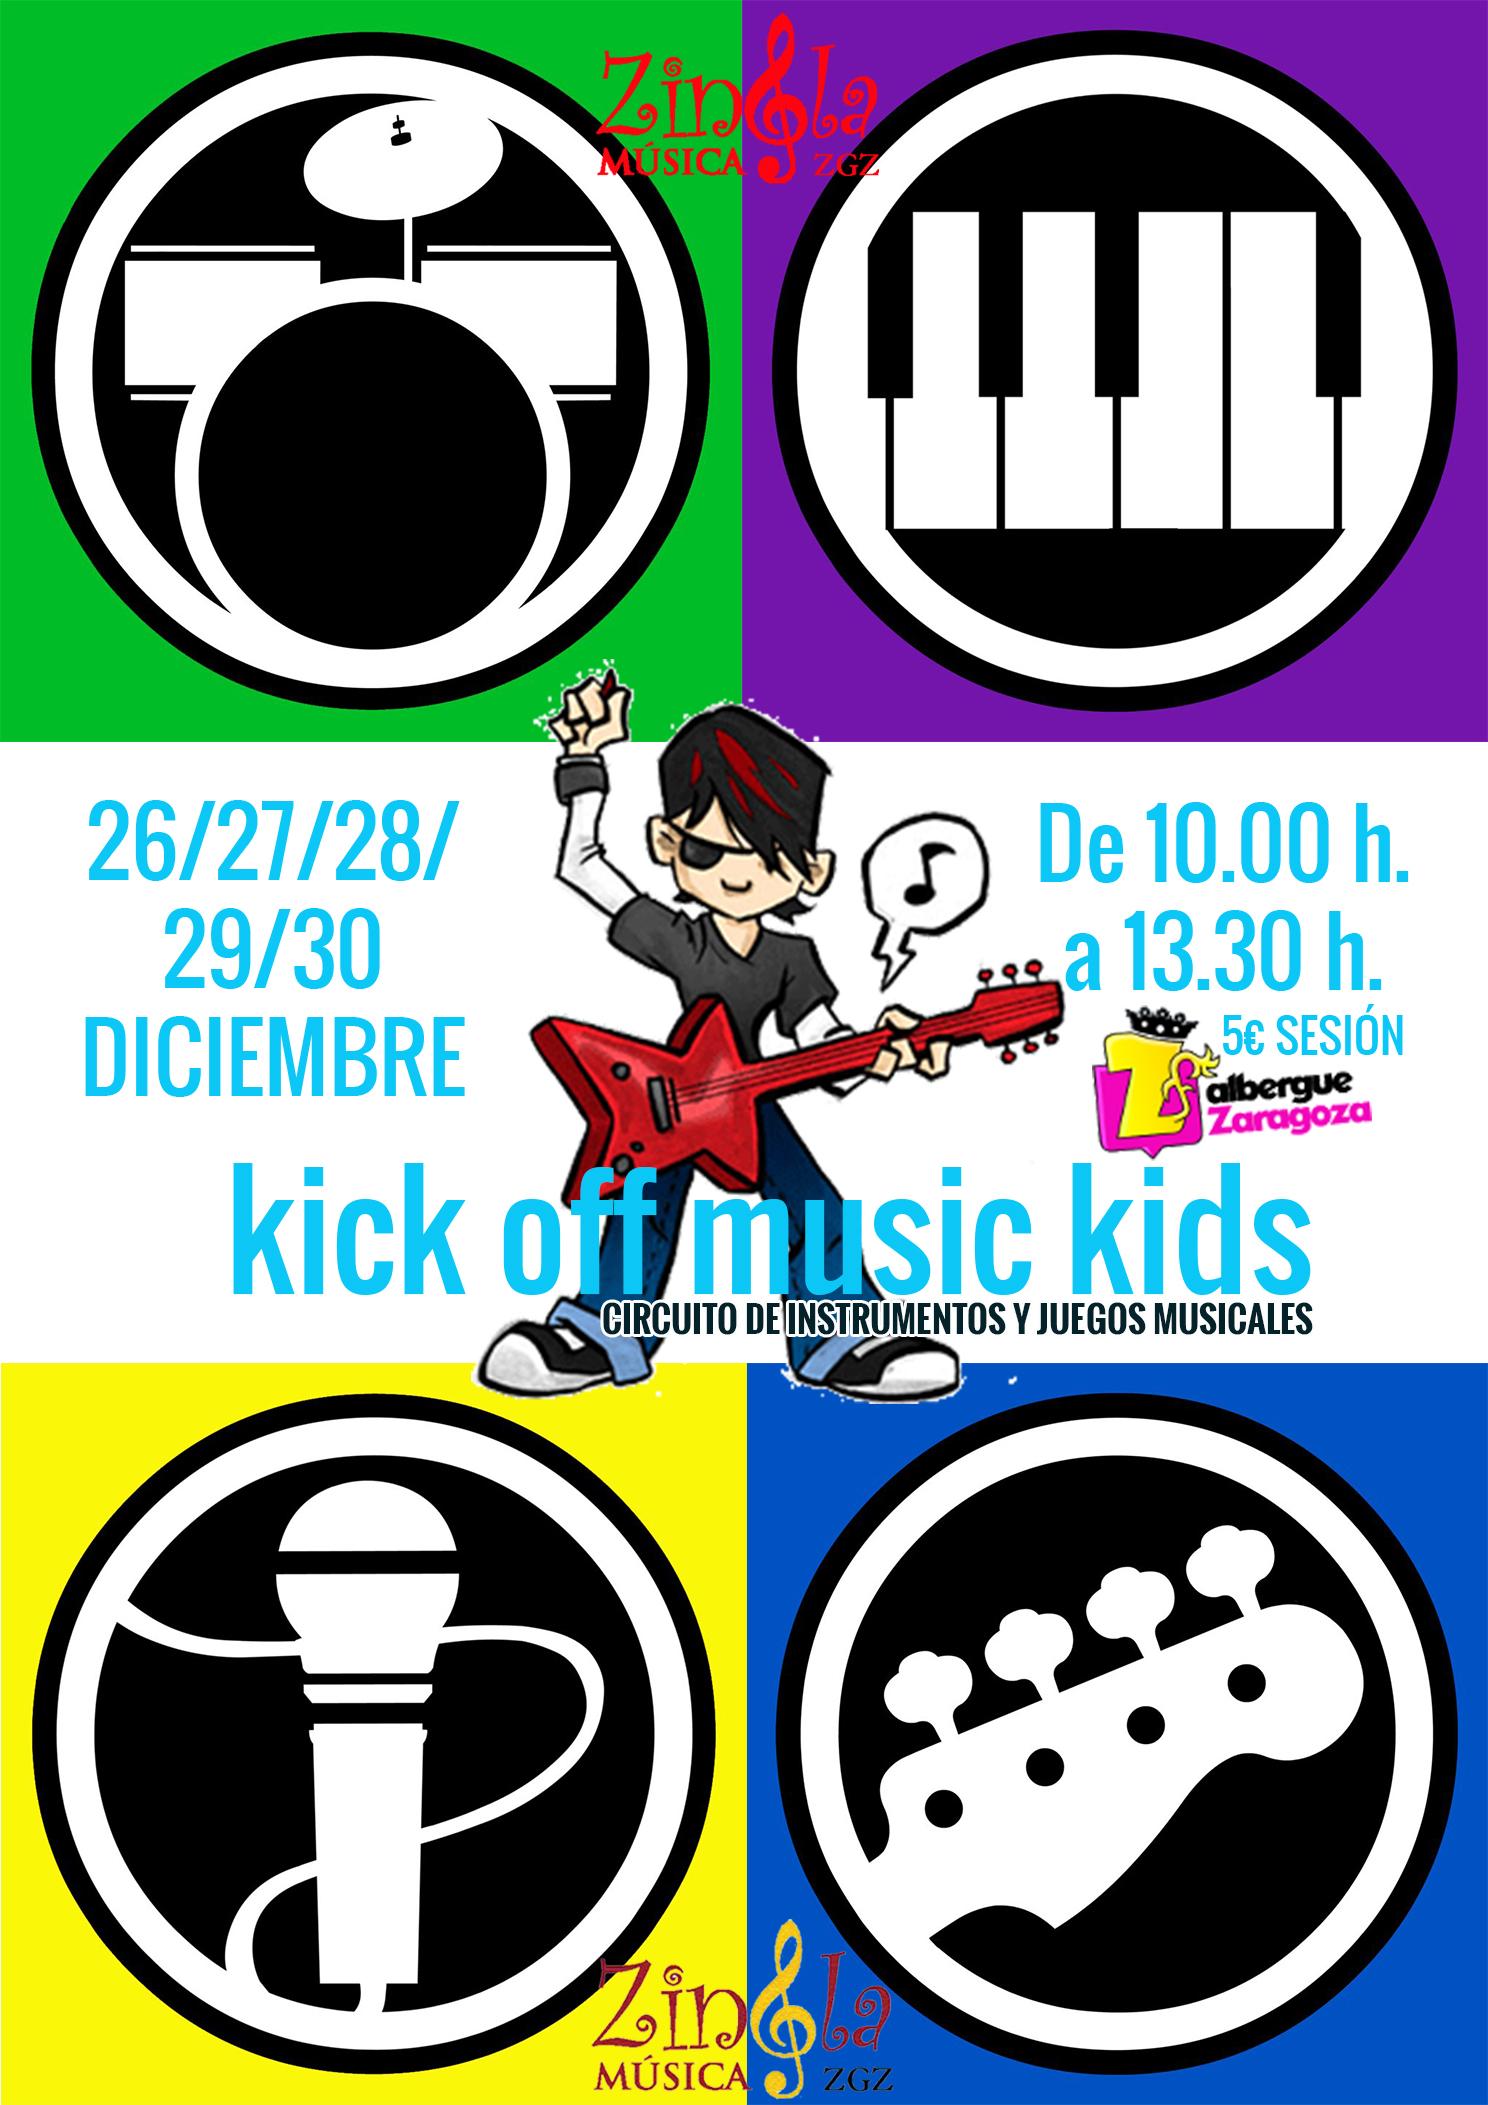 KICK OFF MUSIC KIDS